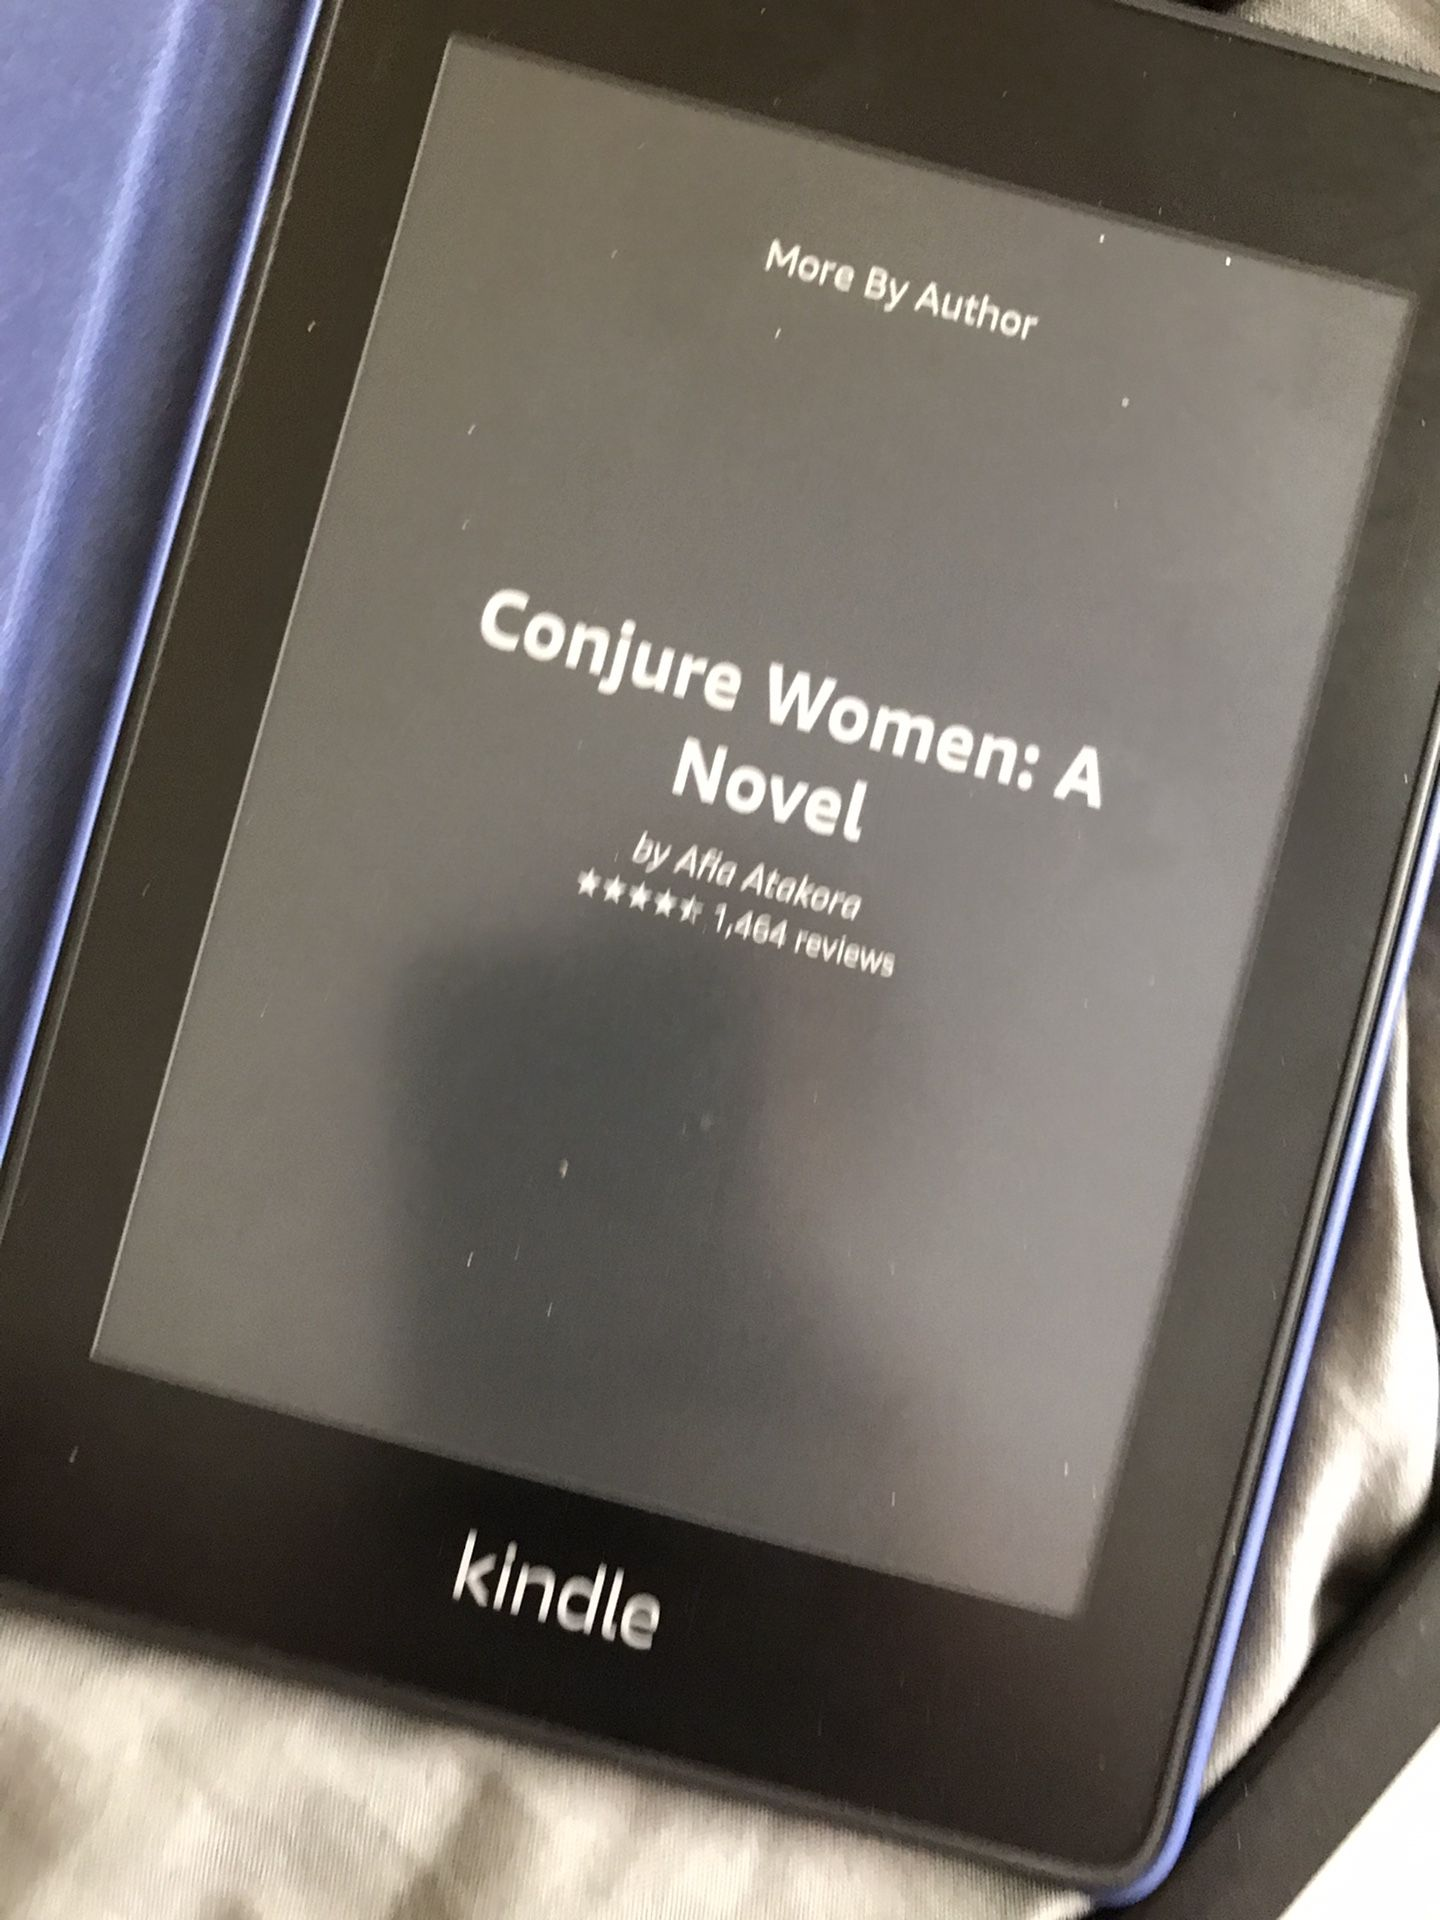 2018,2019,2020 Amazon Kindle Fire Tablets